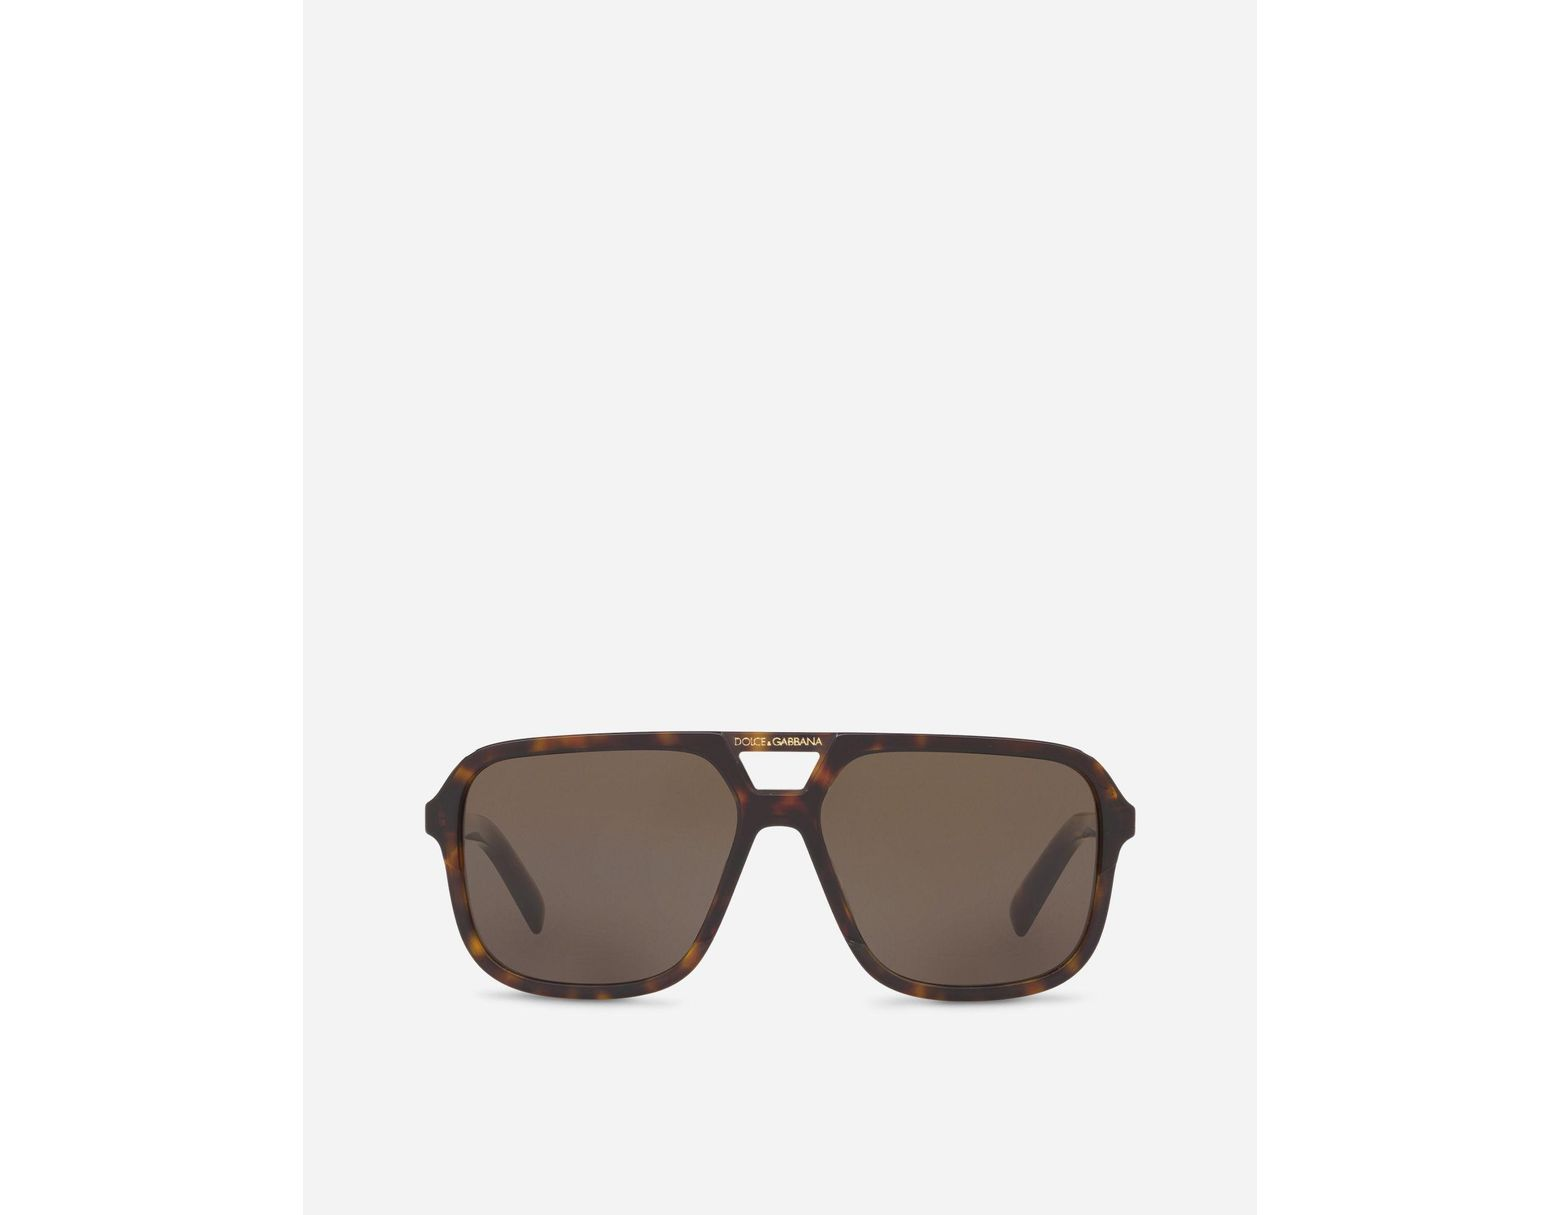 af95460a808f5 Dolce   Gabbana Angel Sunglasses for Men - Lyst